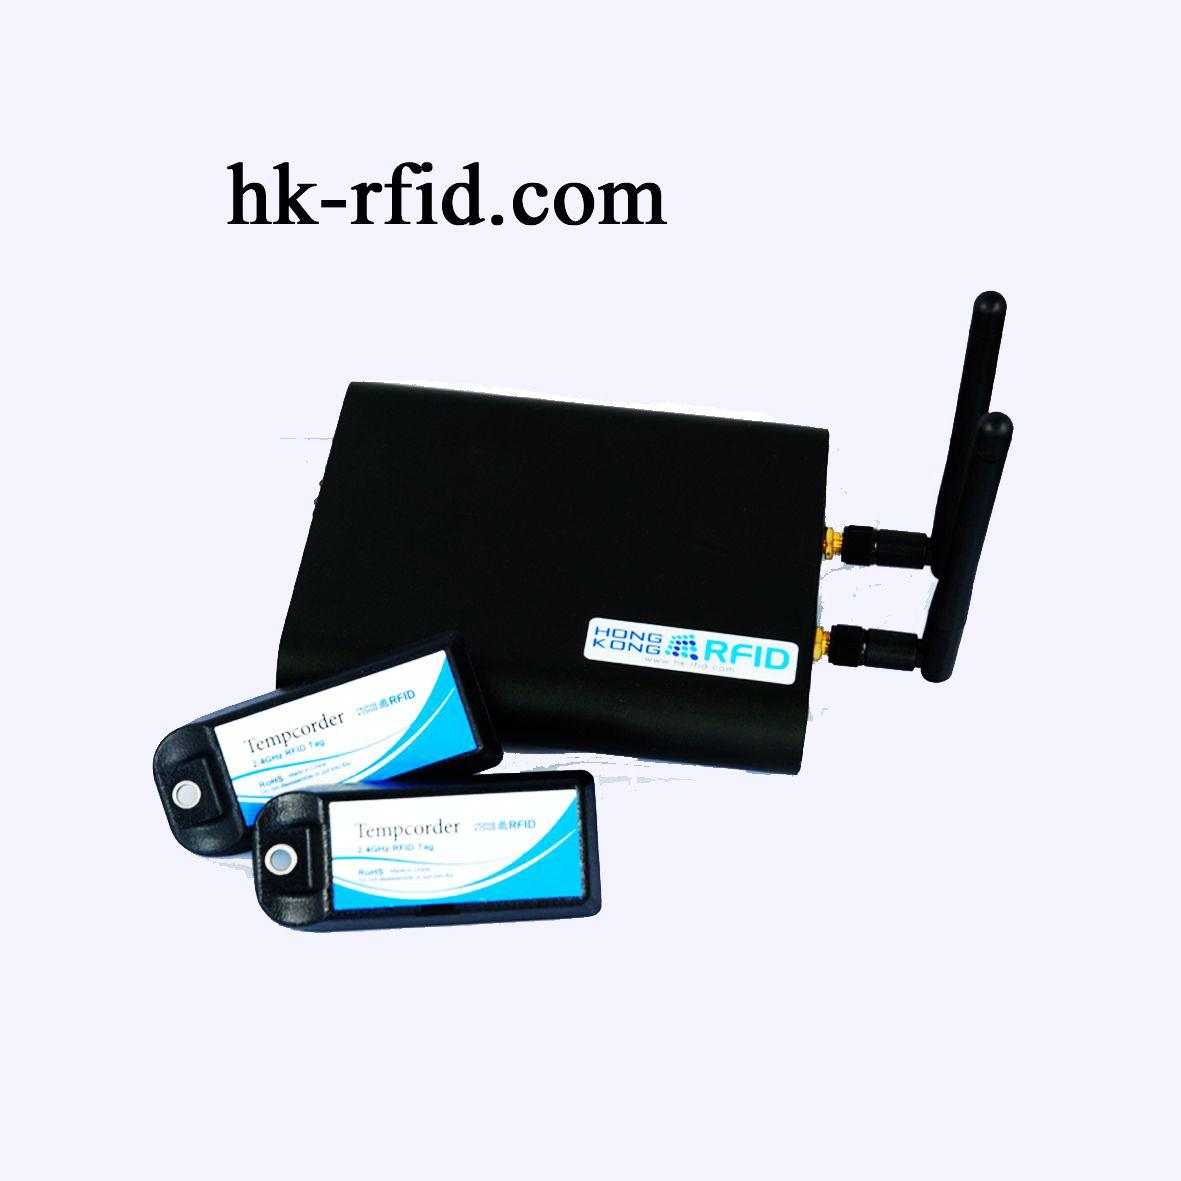 HKSKD-EMWF-Rugged_01.jpg